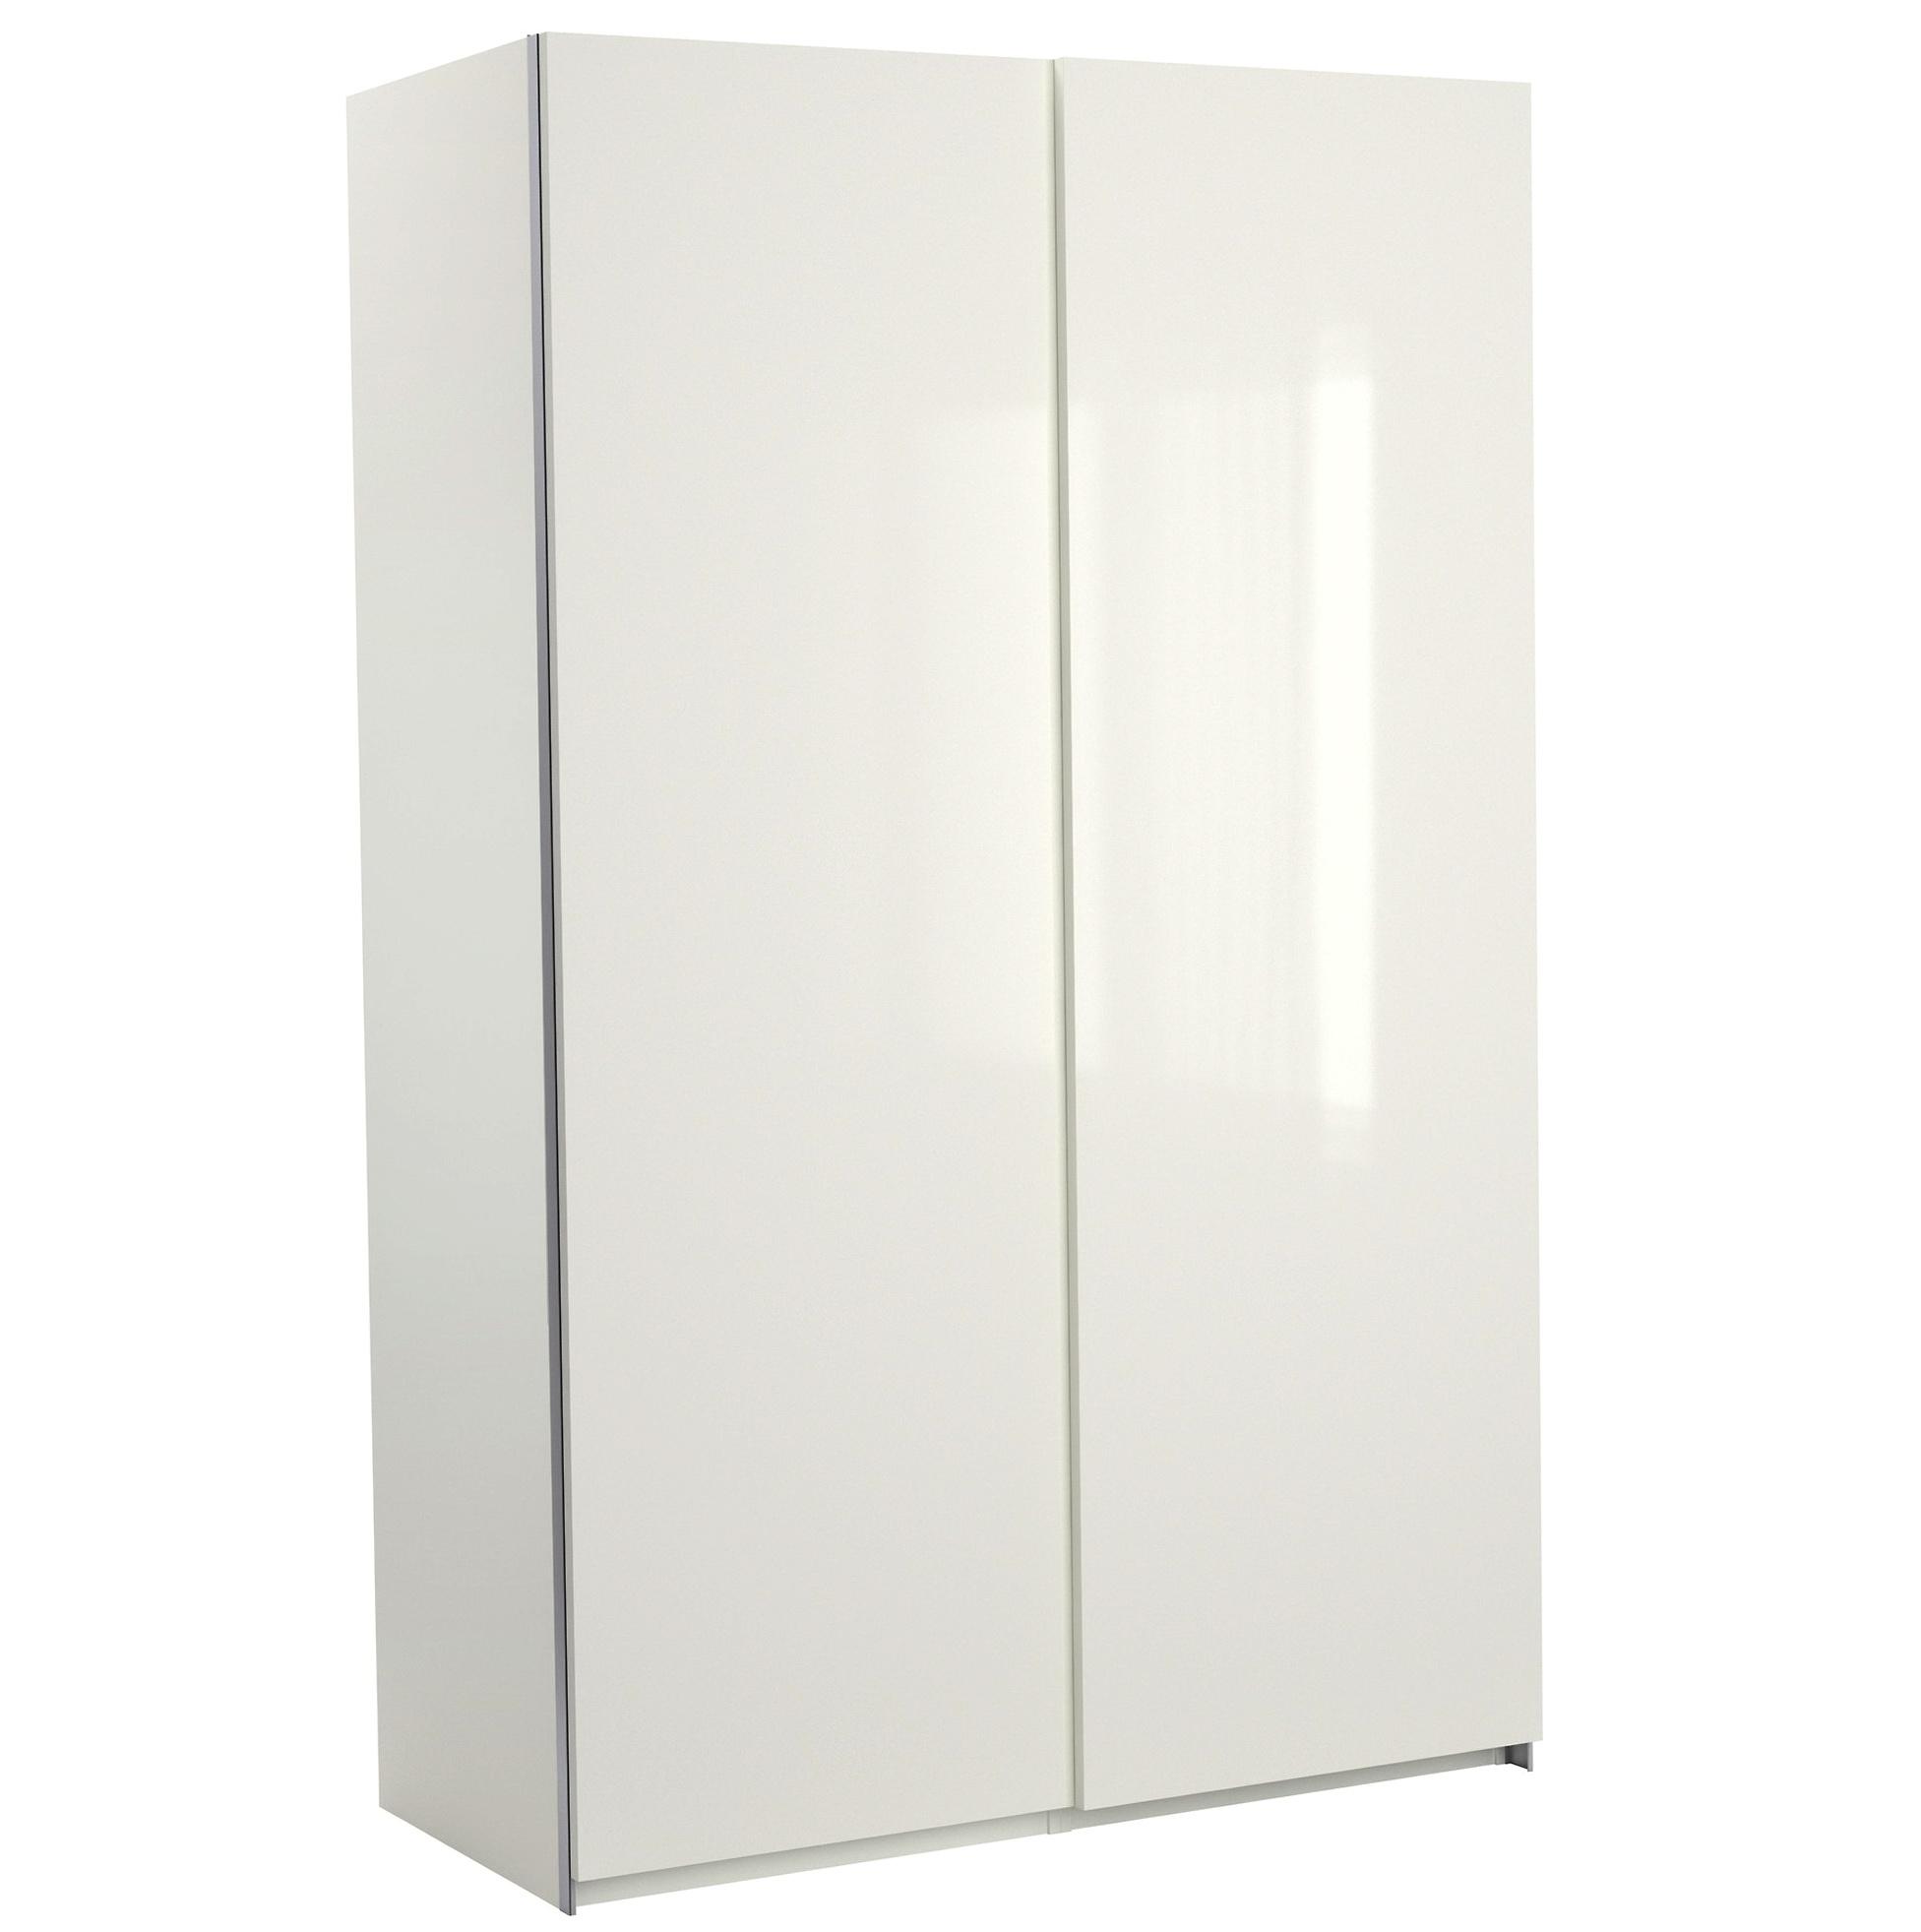 Ikea Bifold Closet Doors